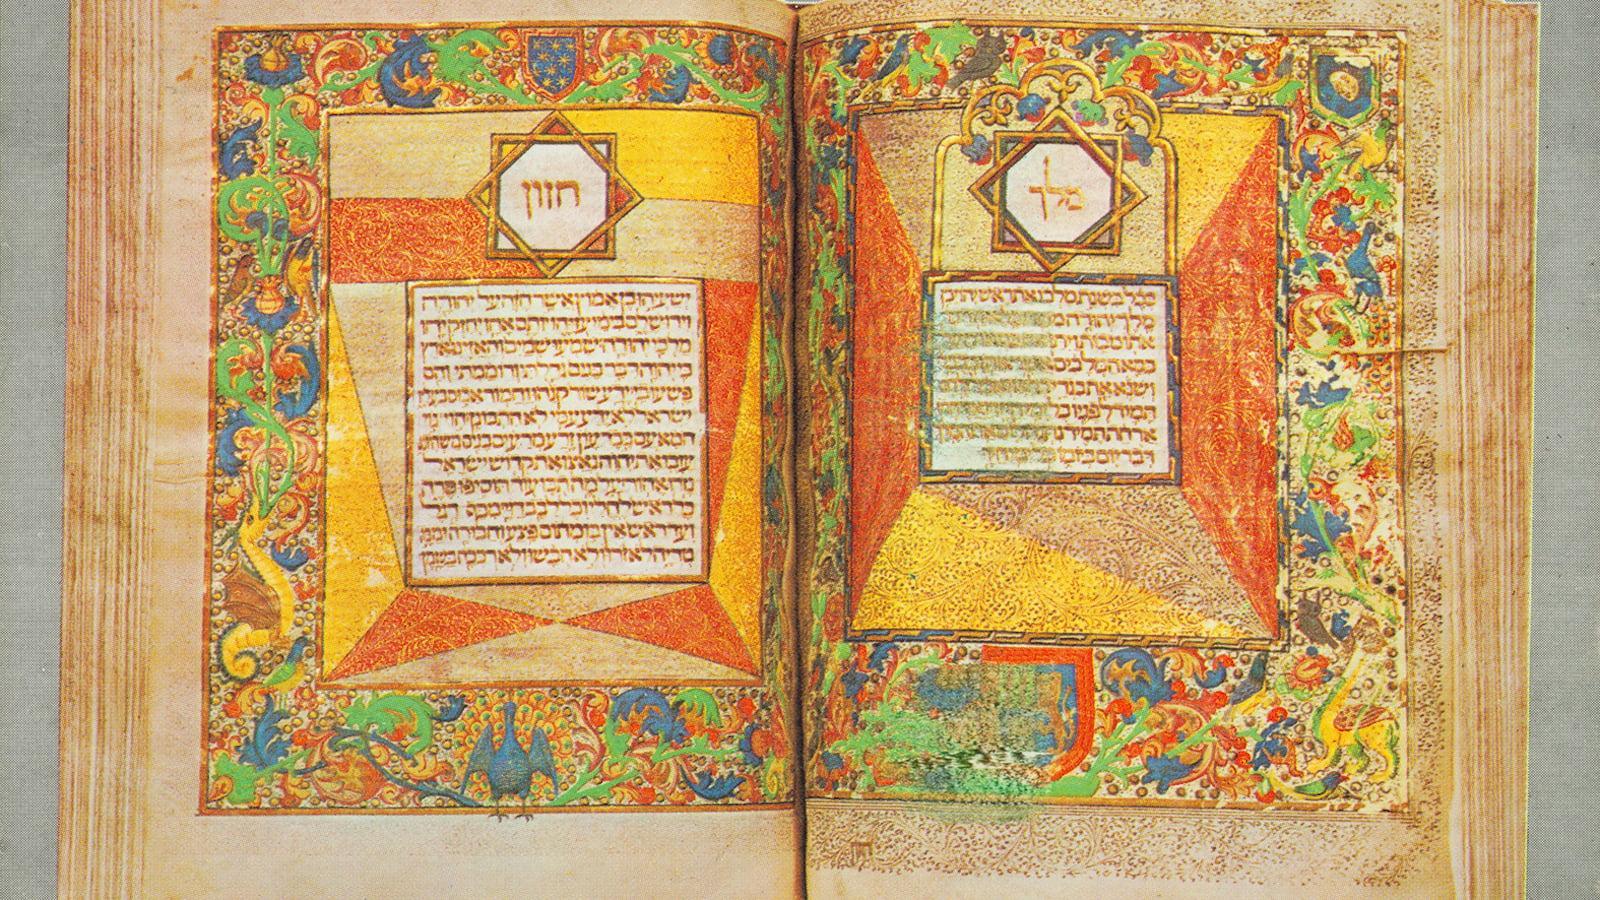 Medieval manuscript in Hebrew.